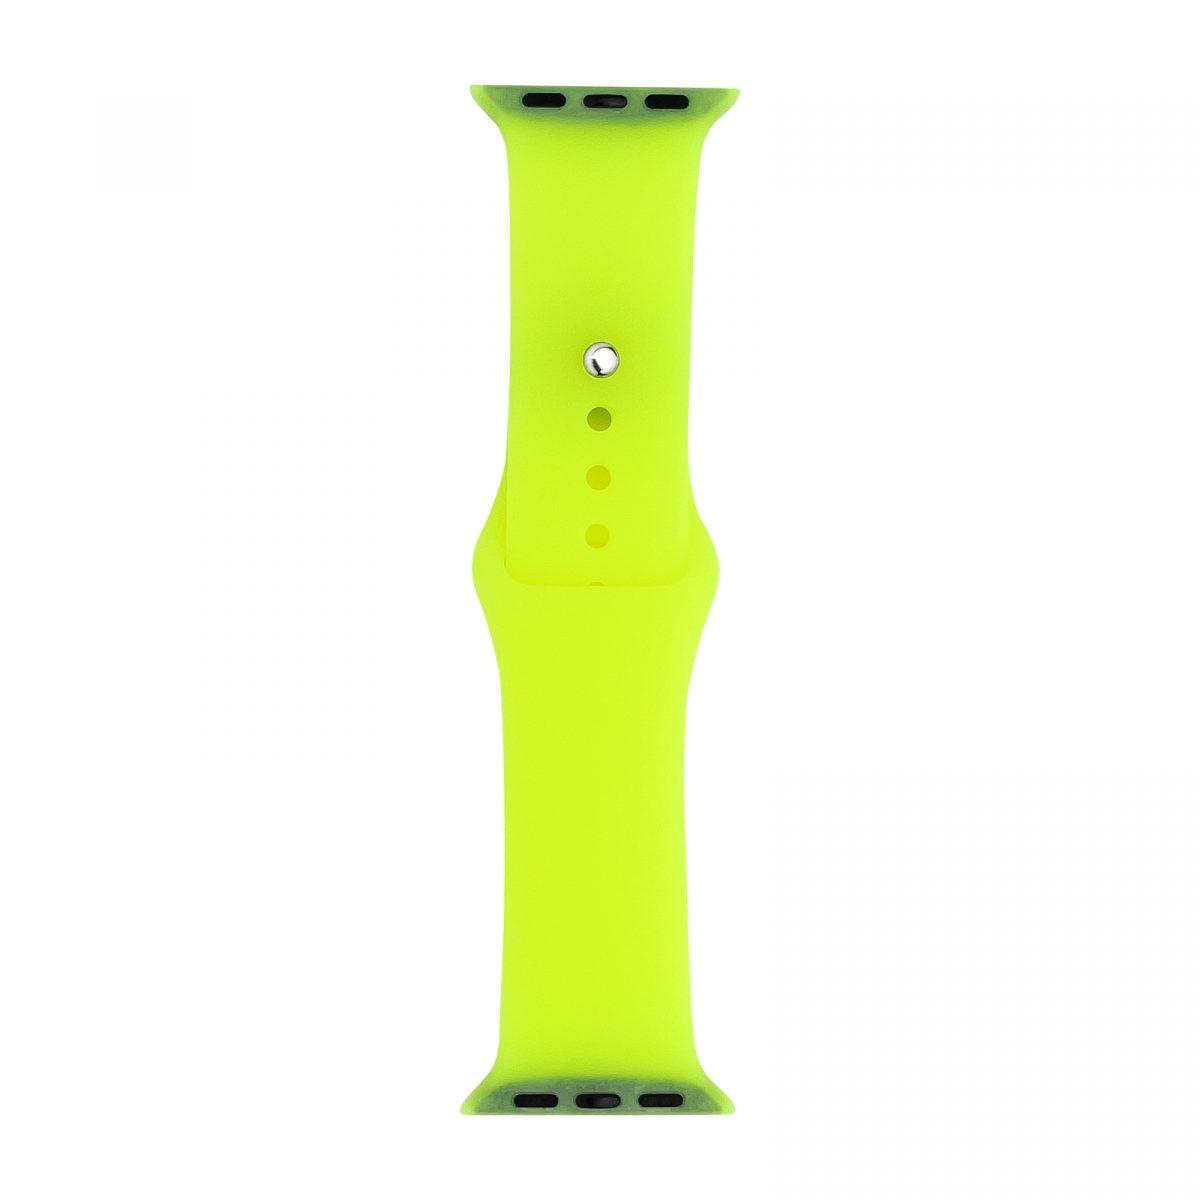 Volt Neon Glow In The Dark Apple Watch Band Glow Bands